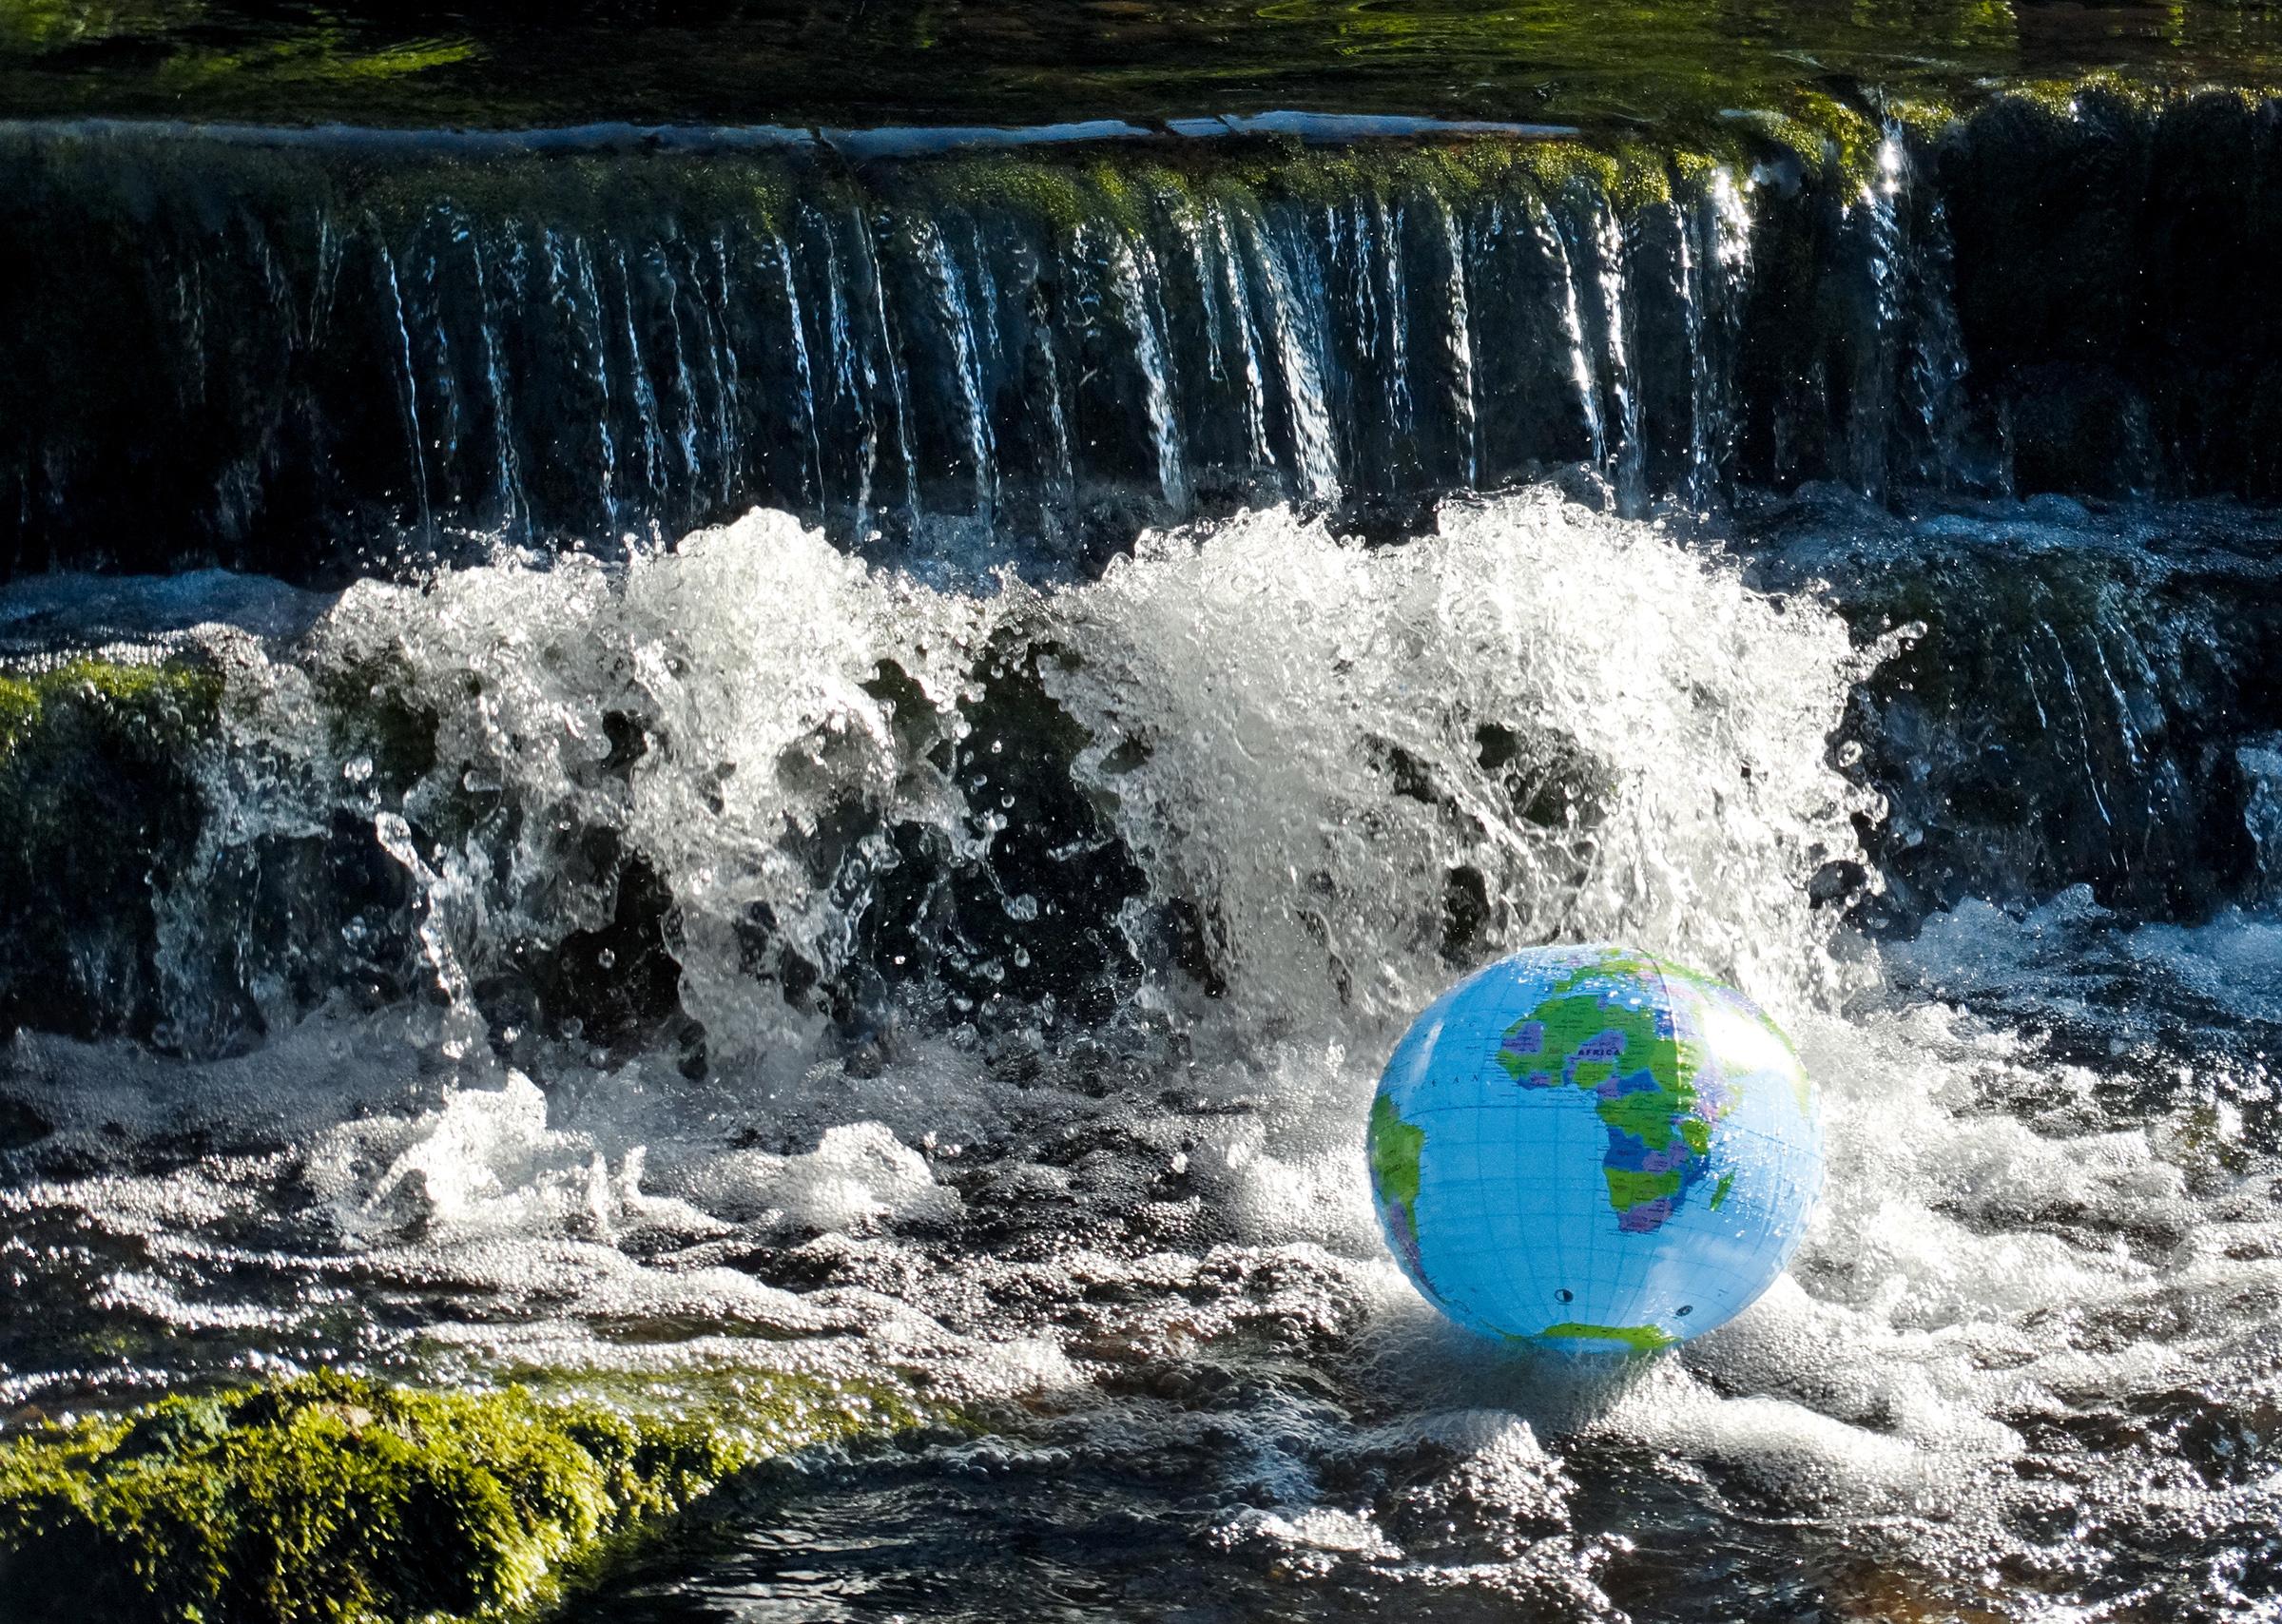 2021-2-17-Marin Kipp-Naturpark Klimatipp 2021_02_15_Naturpark veröffentlicht Klimatipp01_Marion Kipp